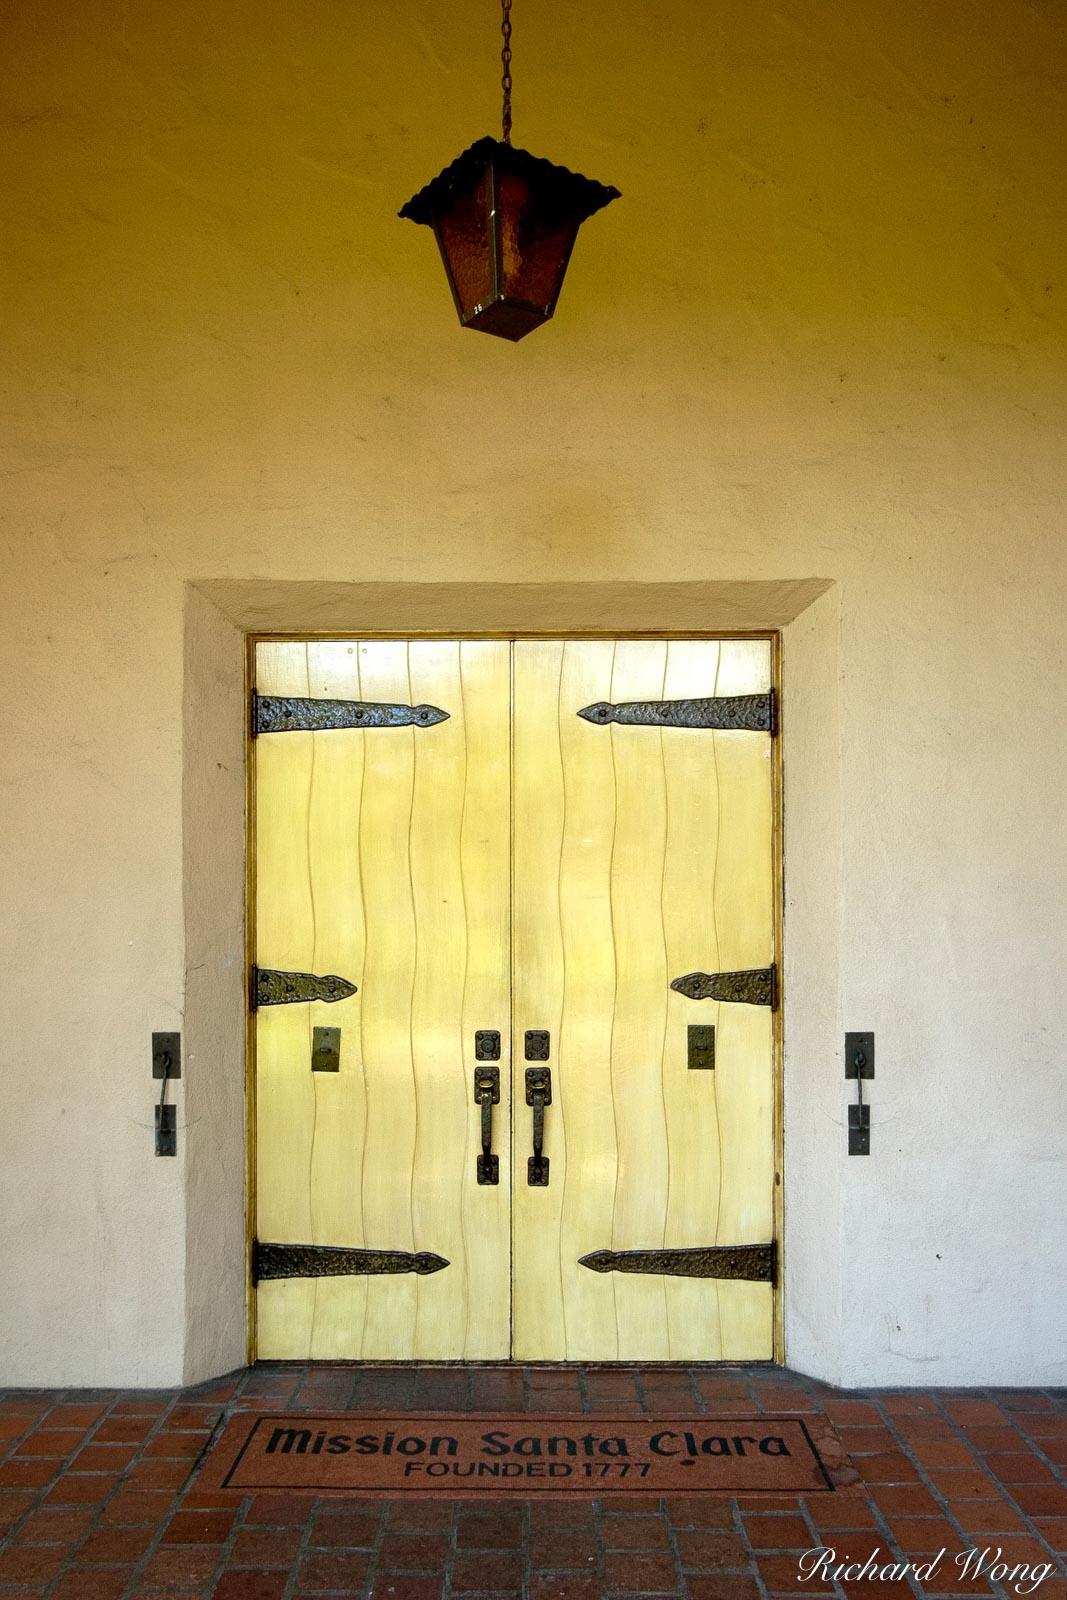 1777, California Missions, Mission Santa Clara de Asis, Santa Clara University, catholic, chapel door, chapels, christianity, doors, doorway, doorways, el camino real, historical sites, site, spanish,, photo